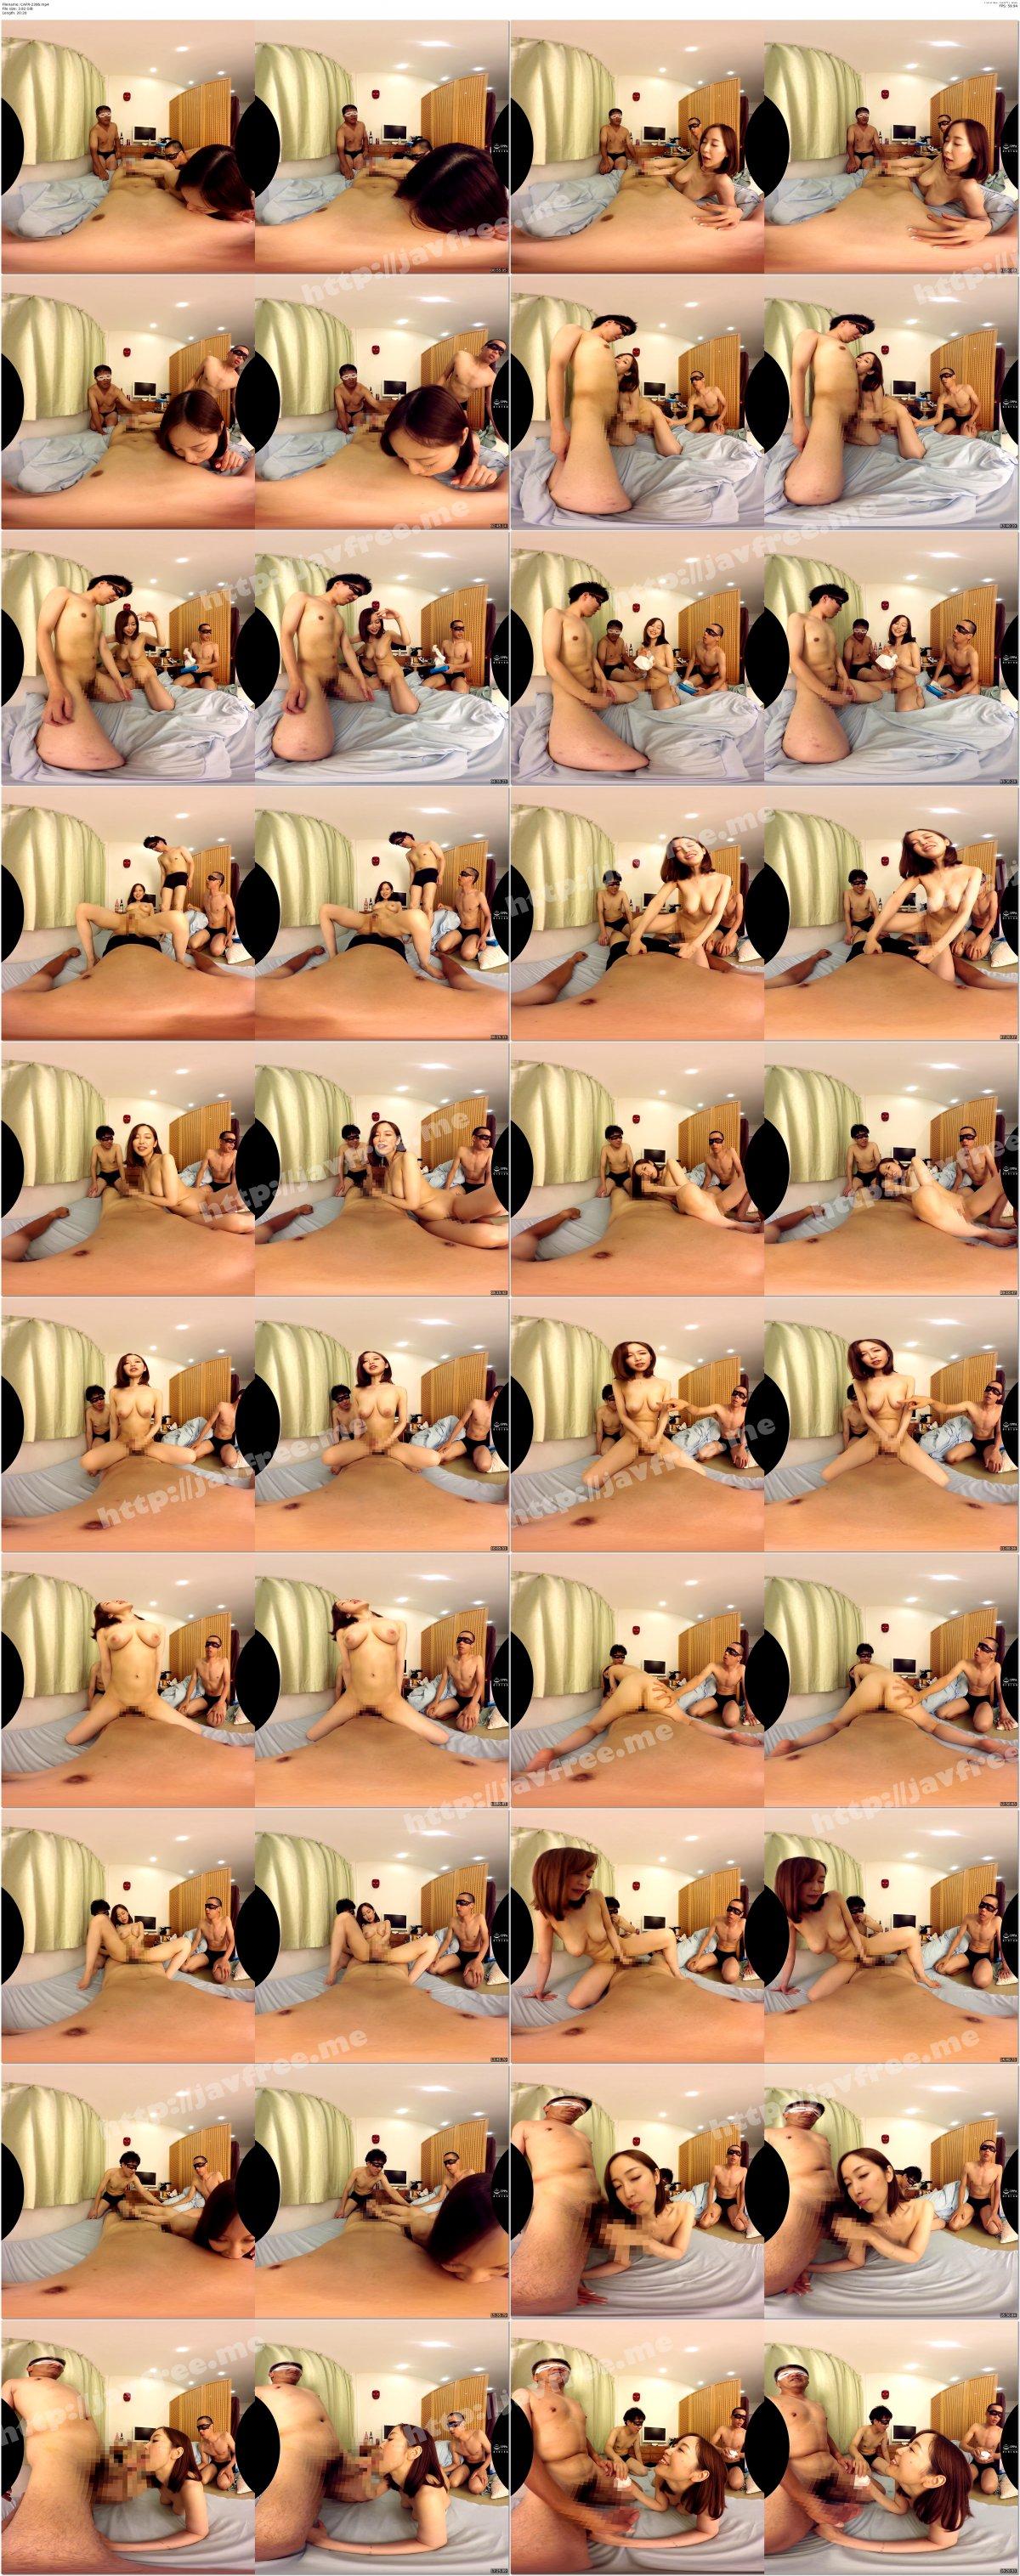 [CAFR-239] 【VR】HQ高画質対応 AV女優にVRカメラを持たせてハメ撮りさせてみたらプライベート感満載だった。篠田ゆう - image CAFR-239b on https://javfree.me